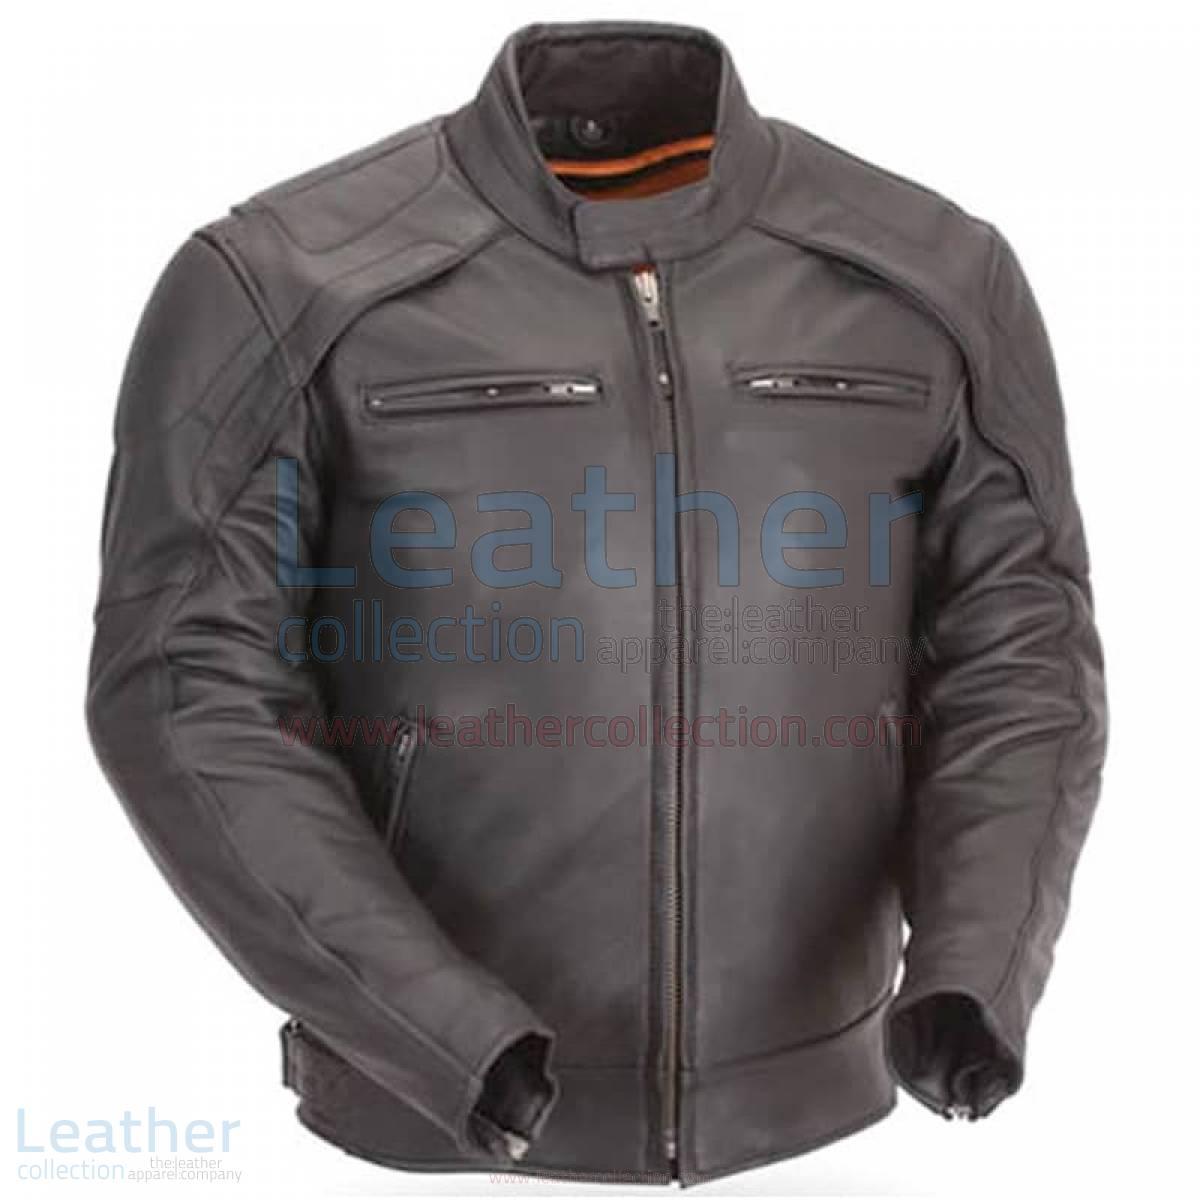 Motorcycle Reflective Piping & Vented Jacket